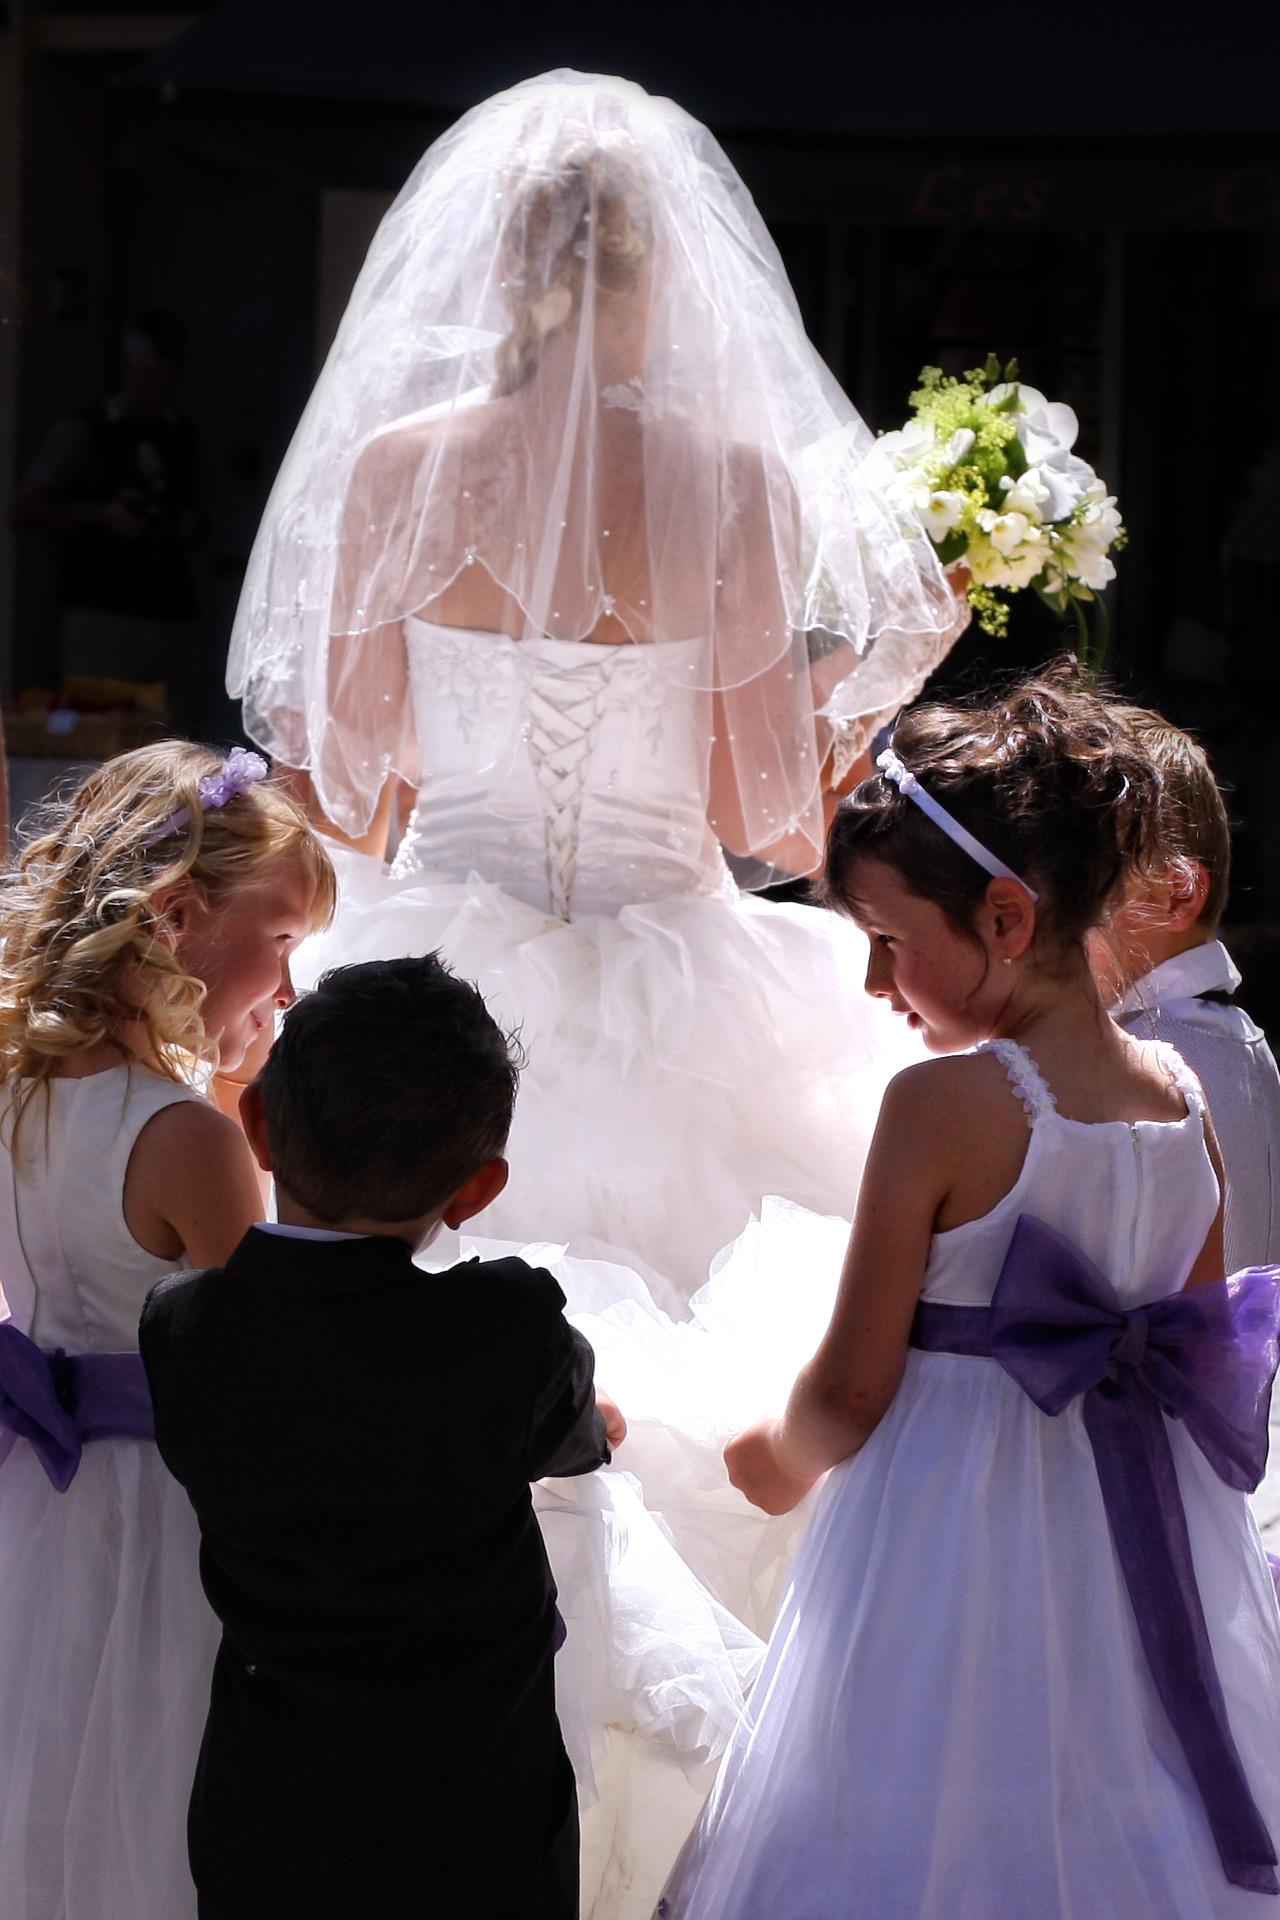 Wedding flower children - St-Rémy-de-Provence, France